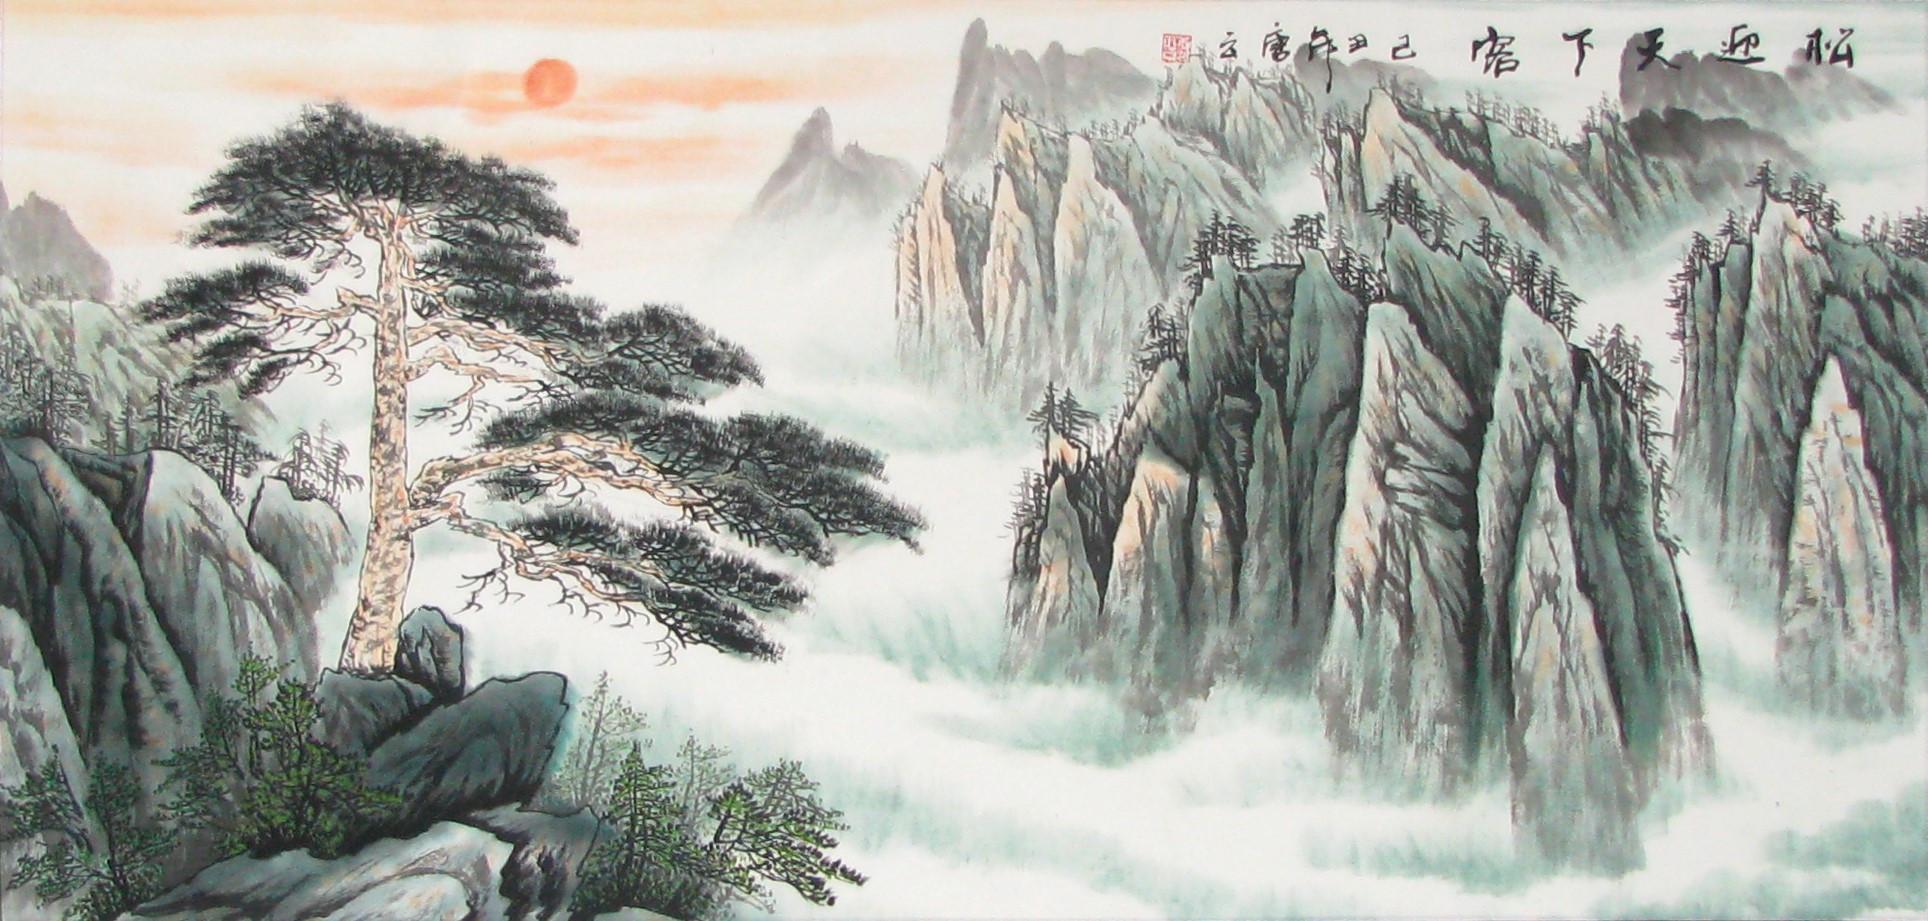 Chinese Landscape Paintings  KUBLA KHAN by Samuel Taylor Coleridge